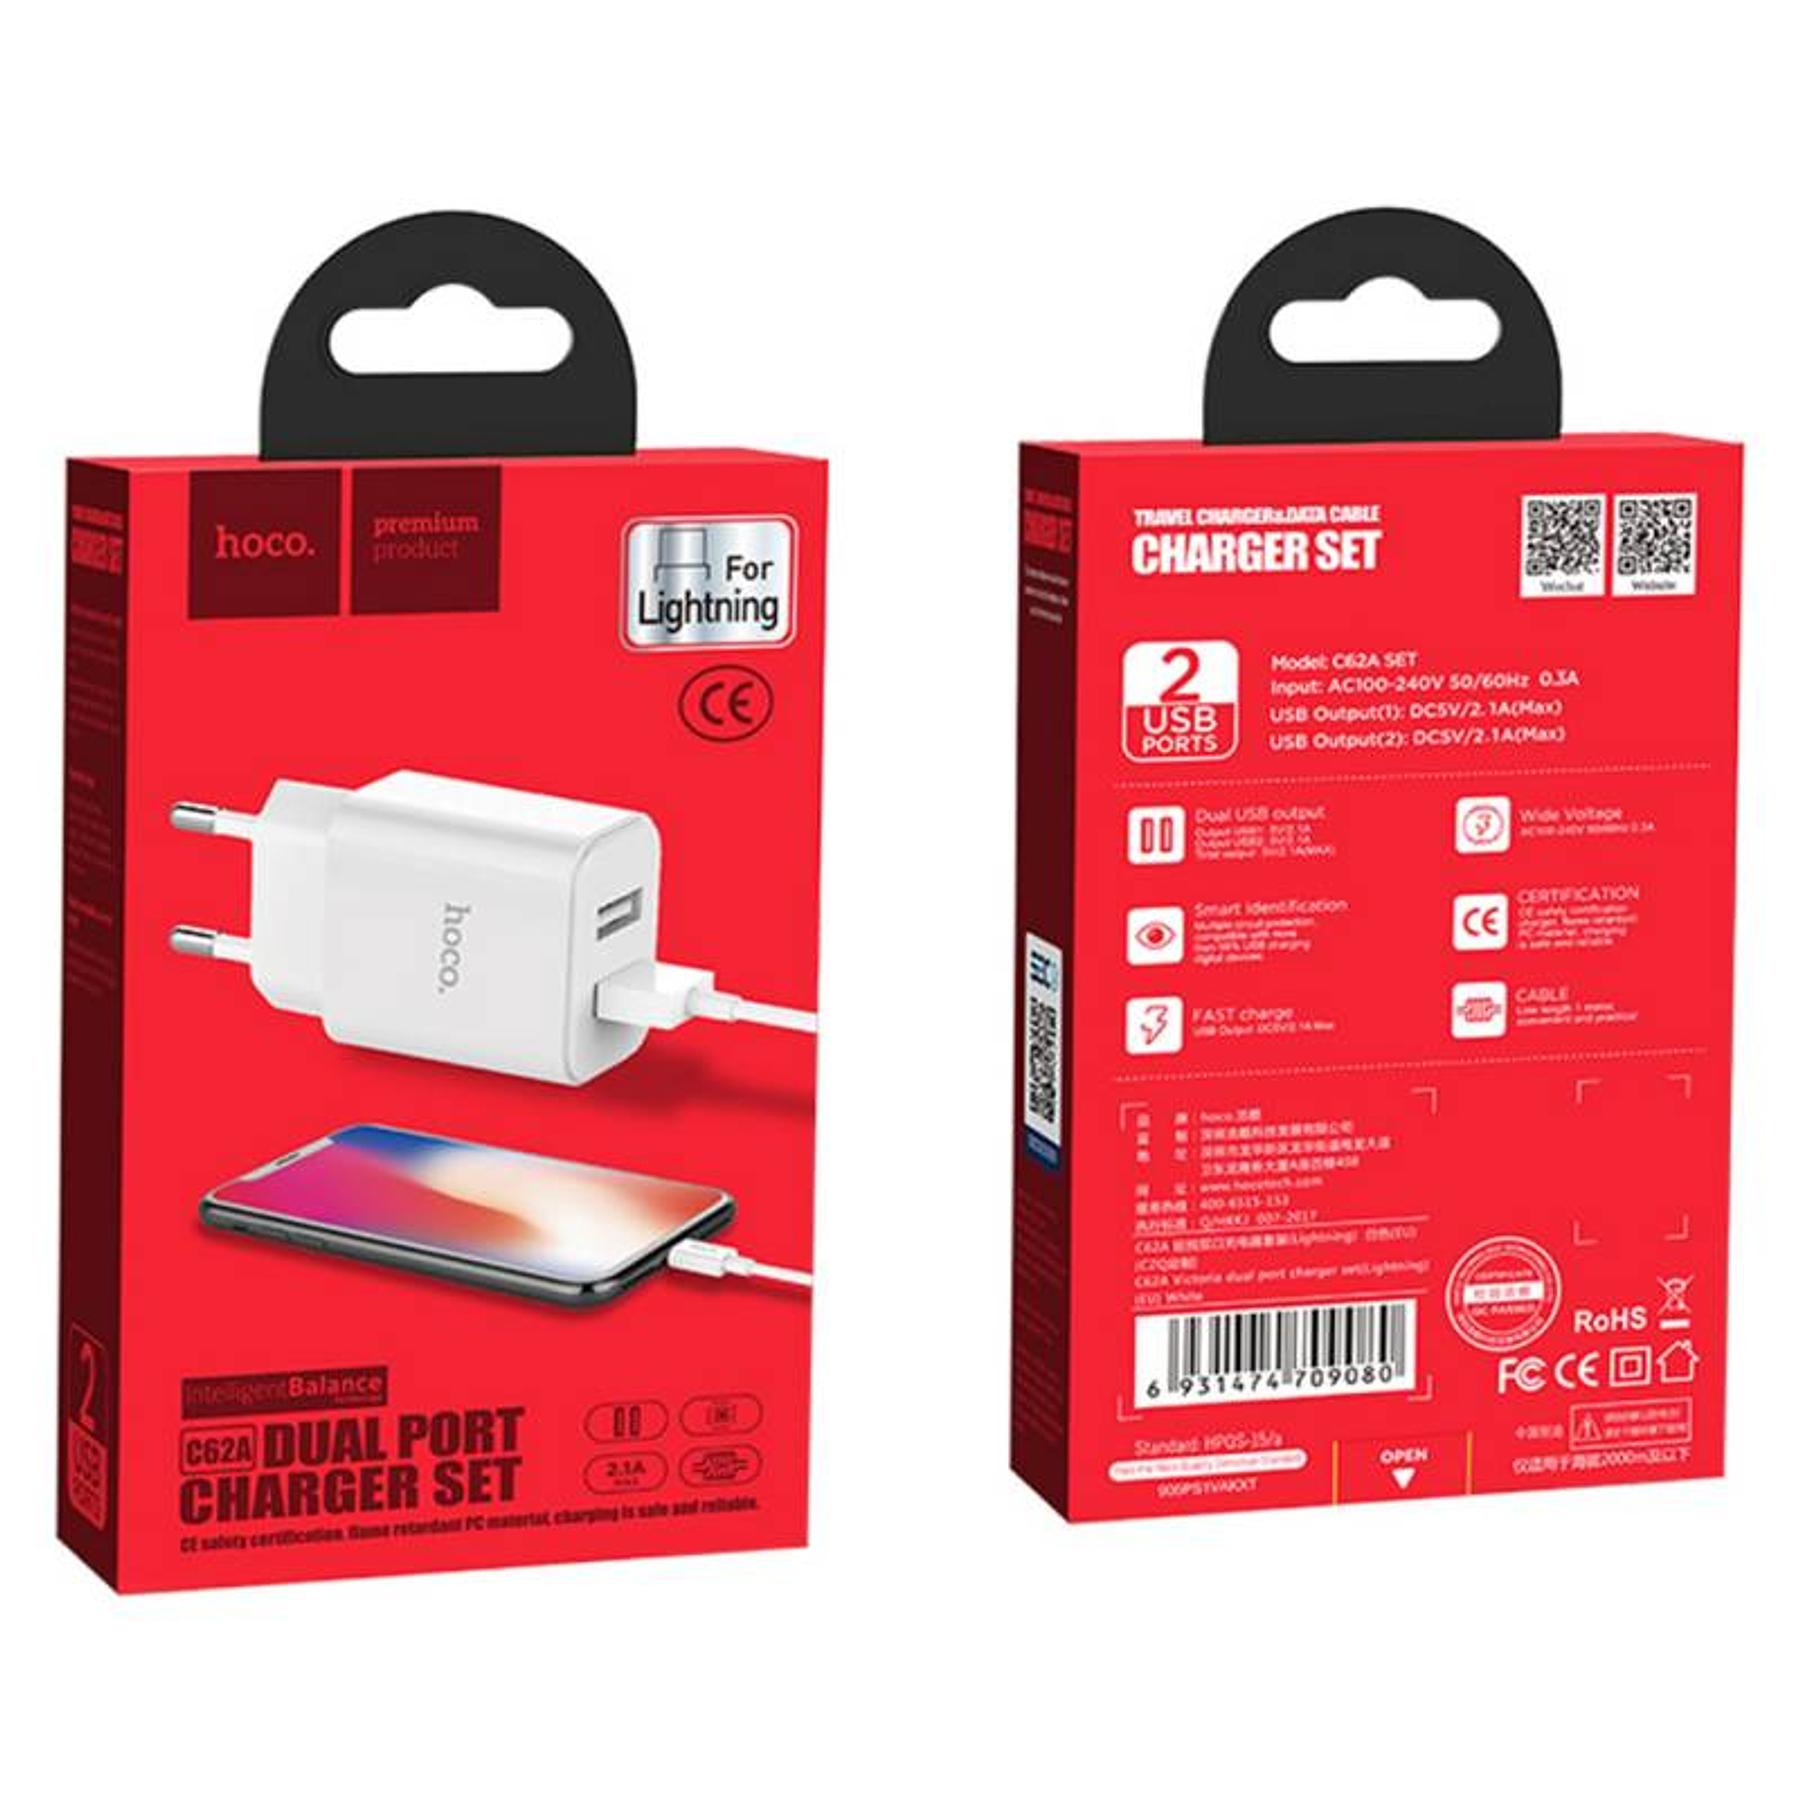 Cargador Completo Lightning con 2 entradas USB - Hoco